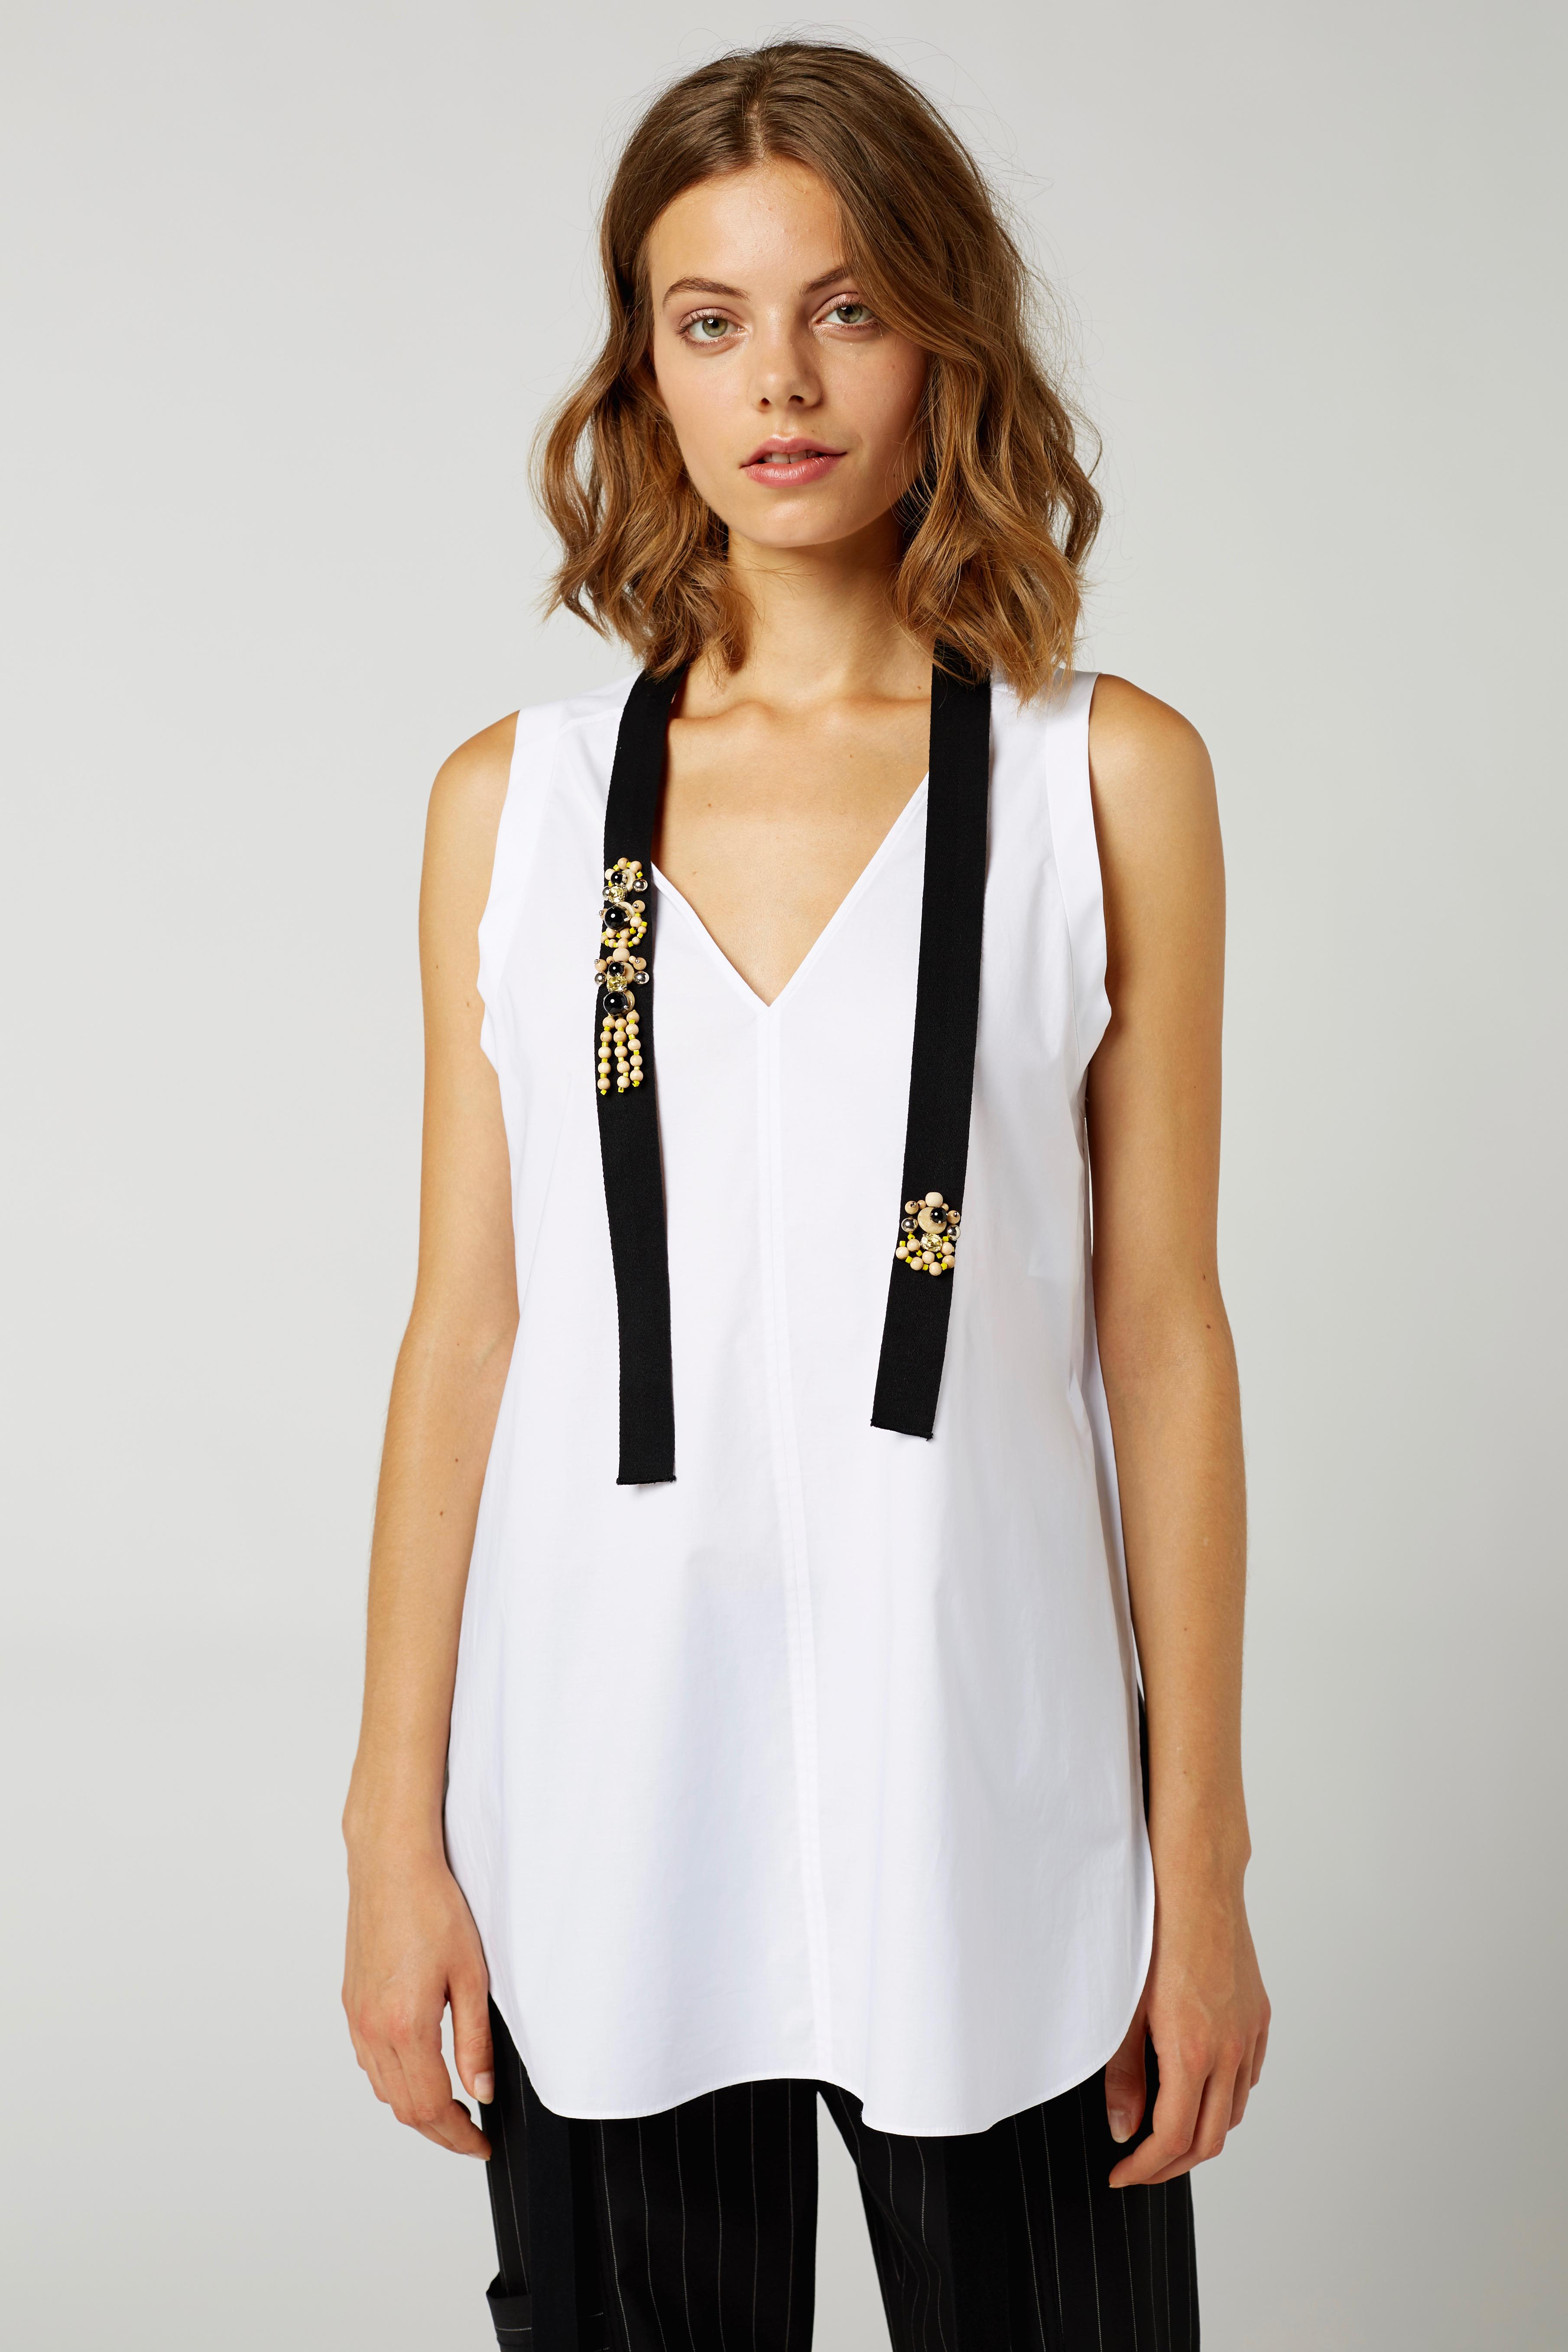 COOL TOUCH blouse sl. less 2 Dorothee Schumacher P88tJ